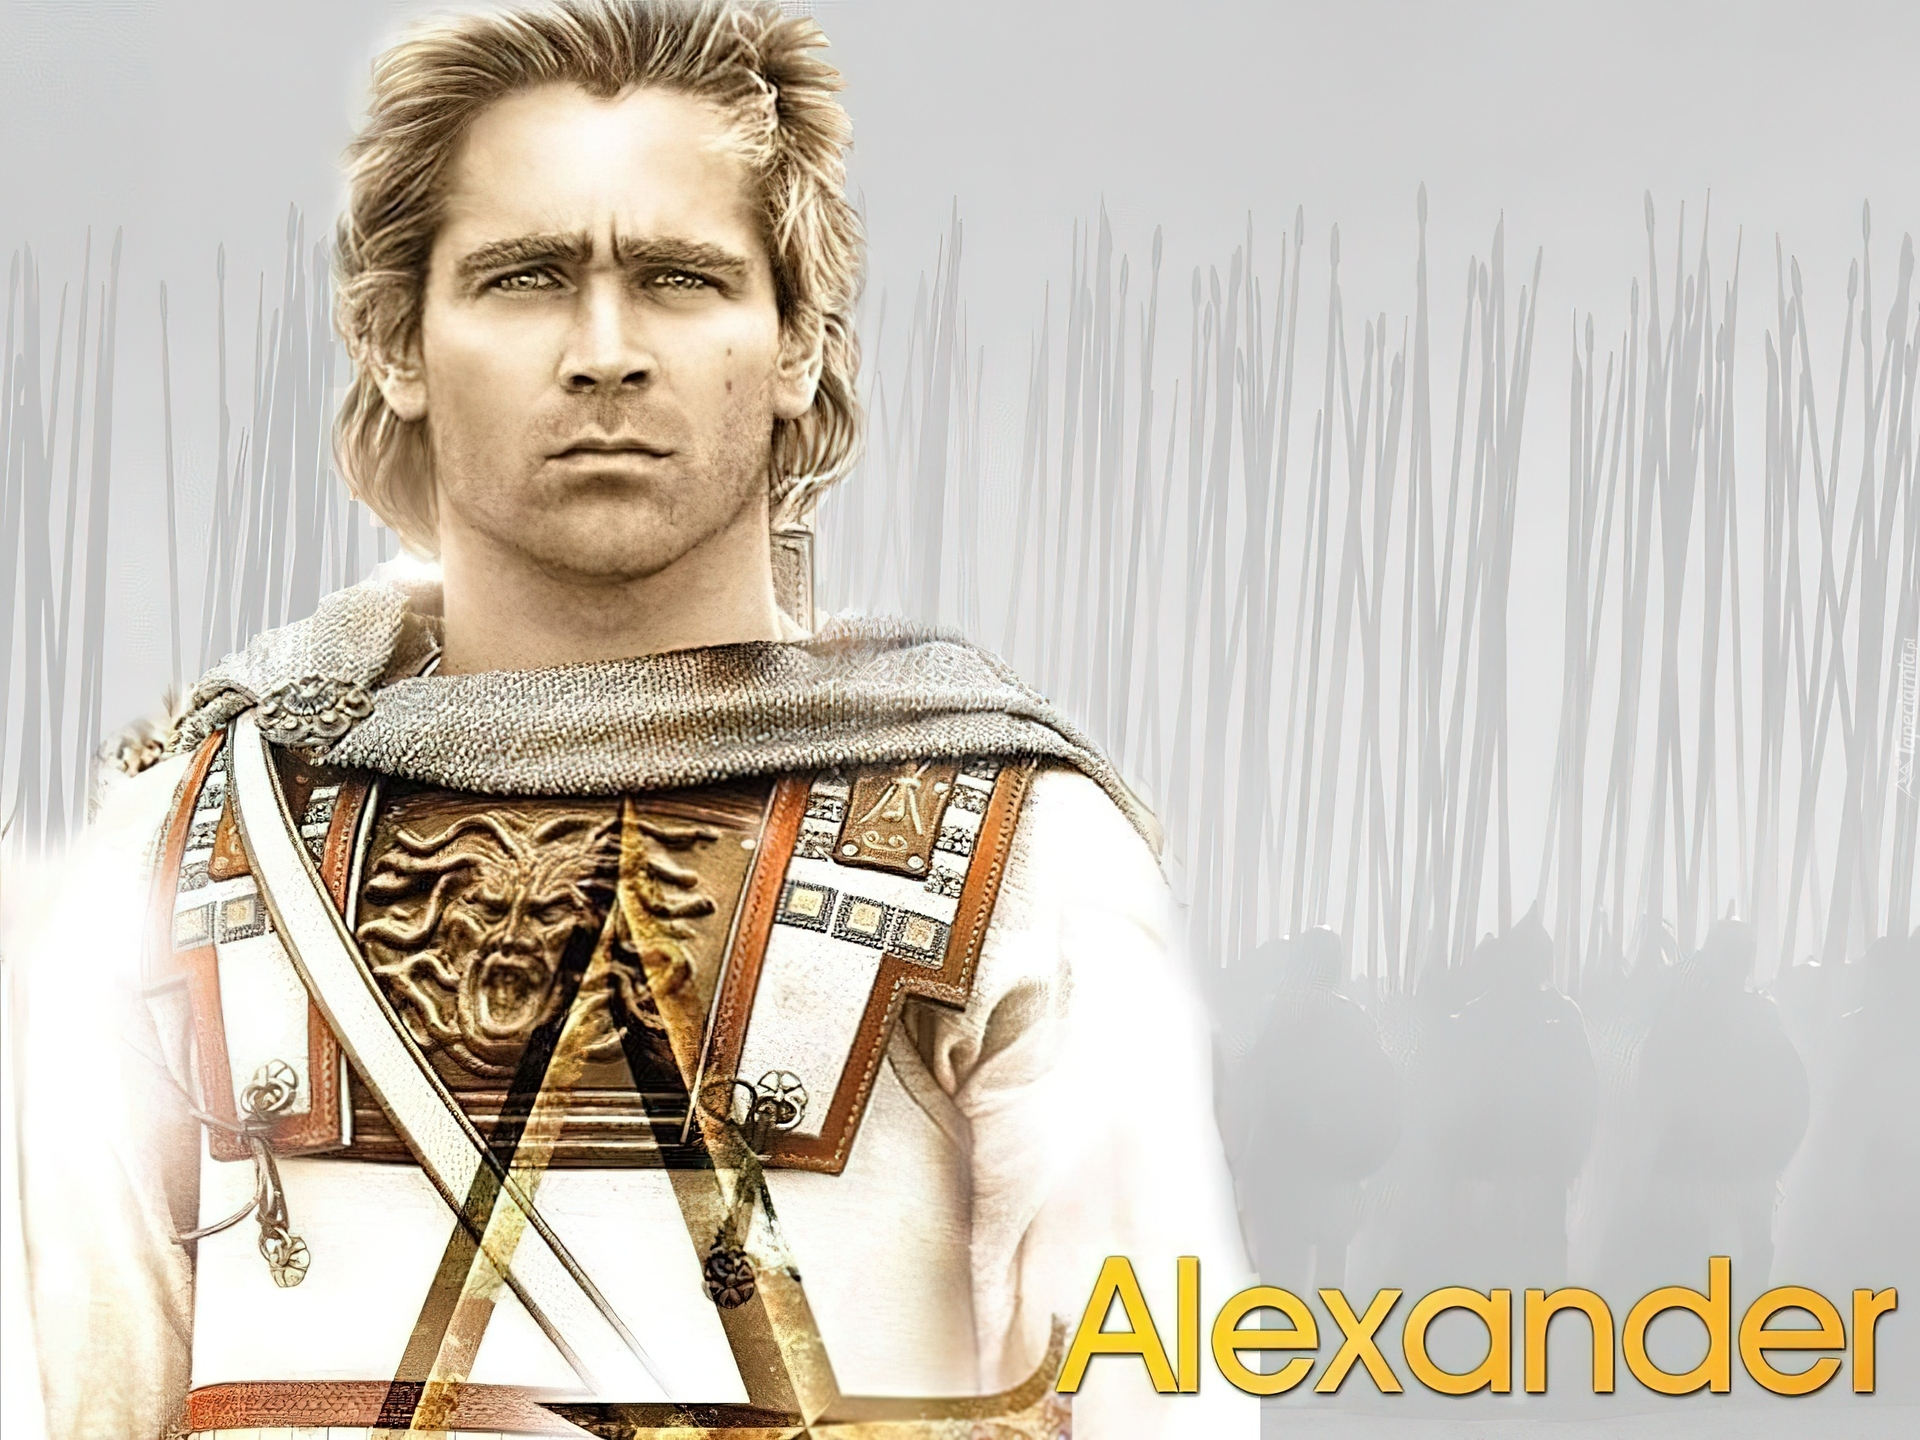 Alexander, Colin Farrell